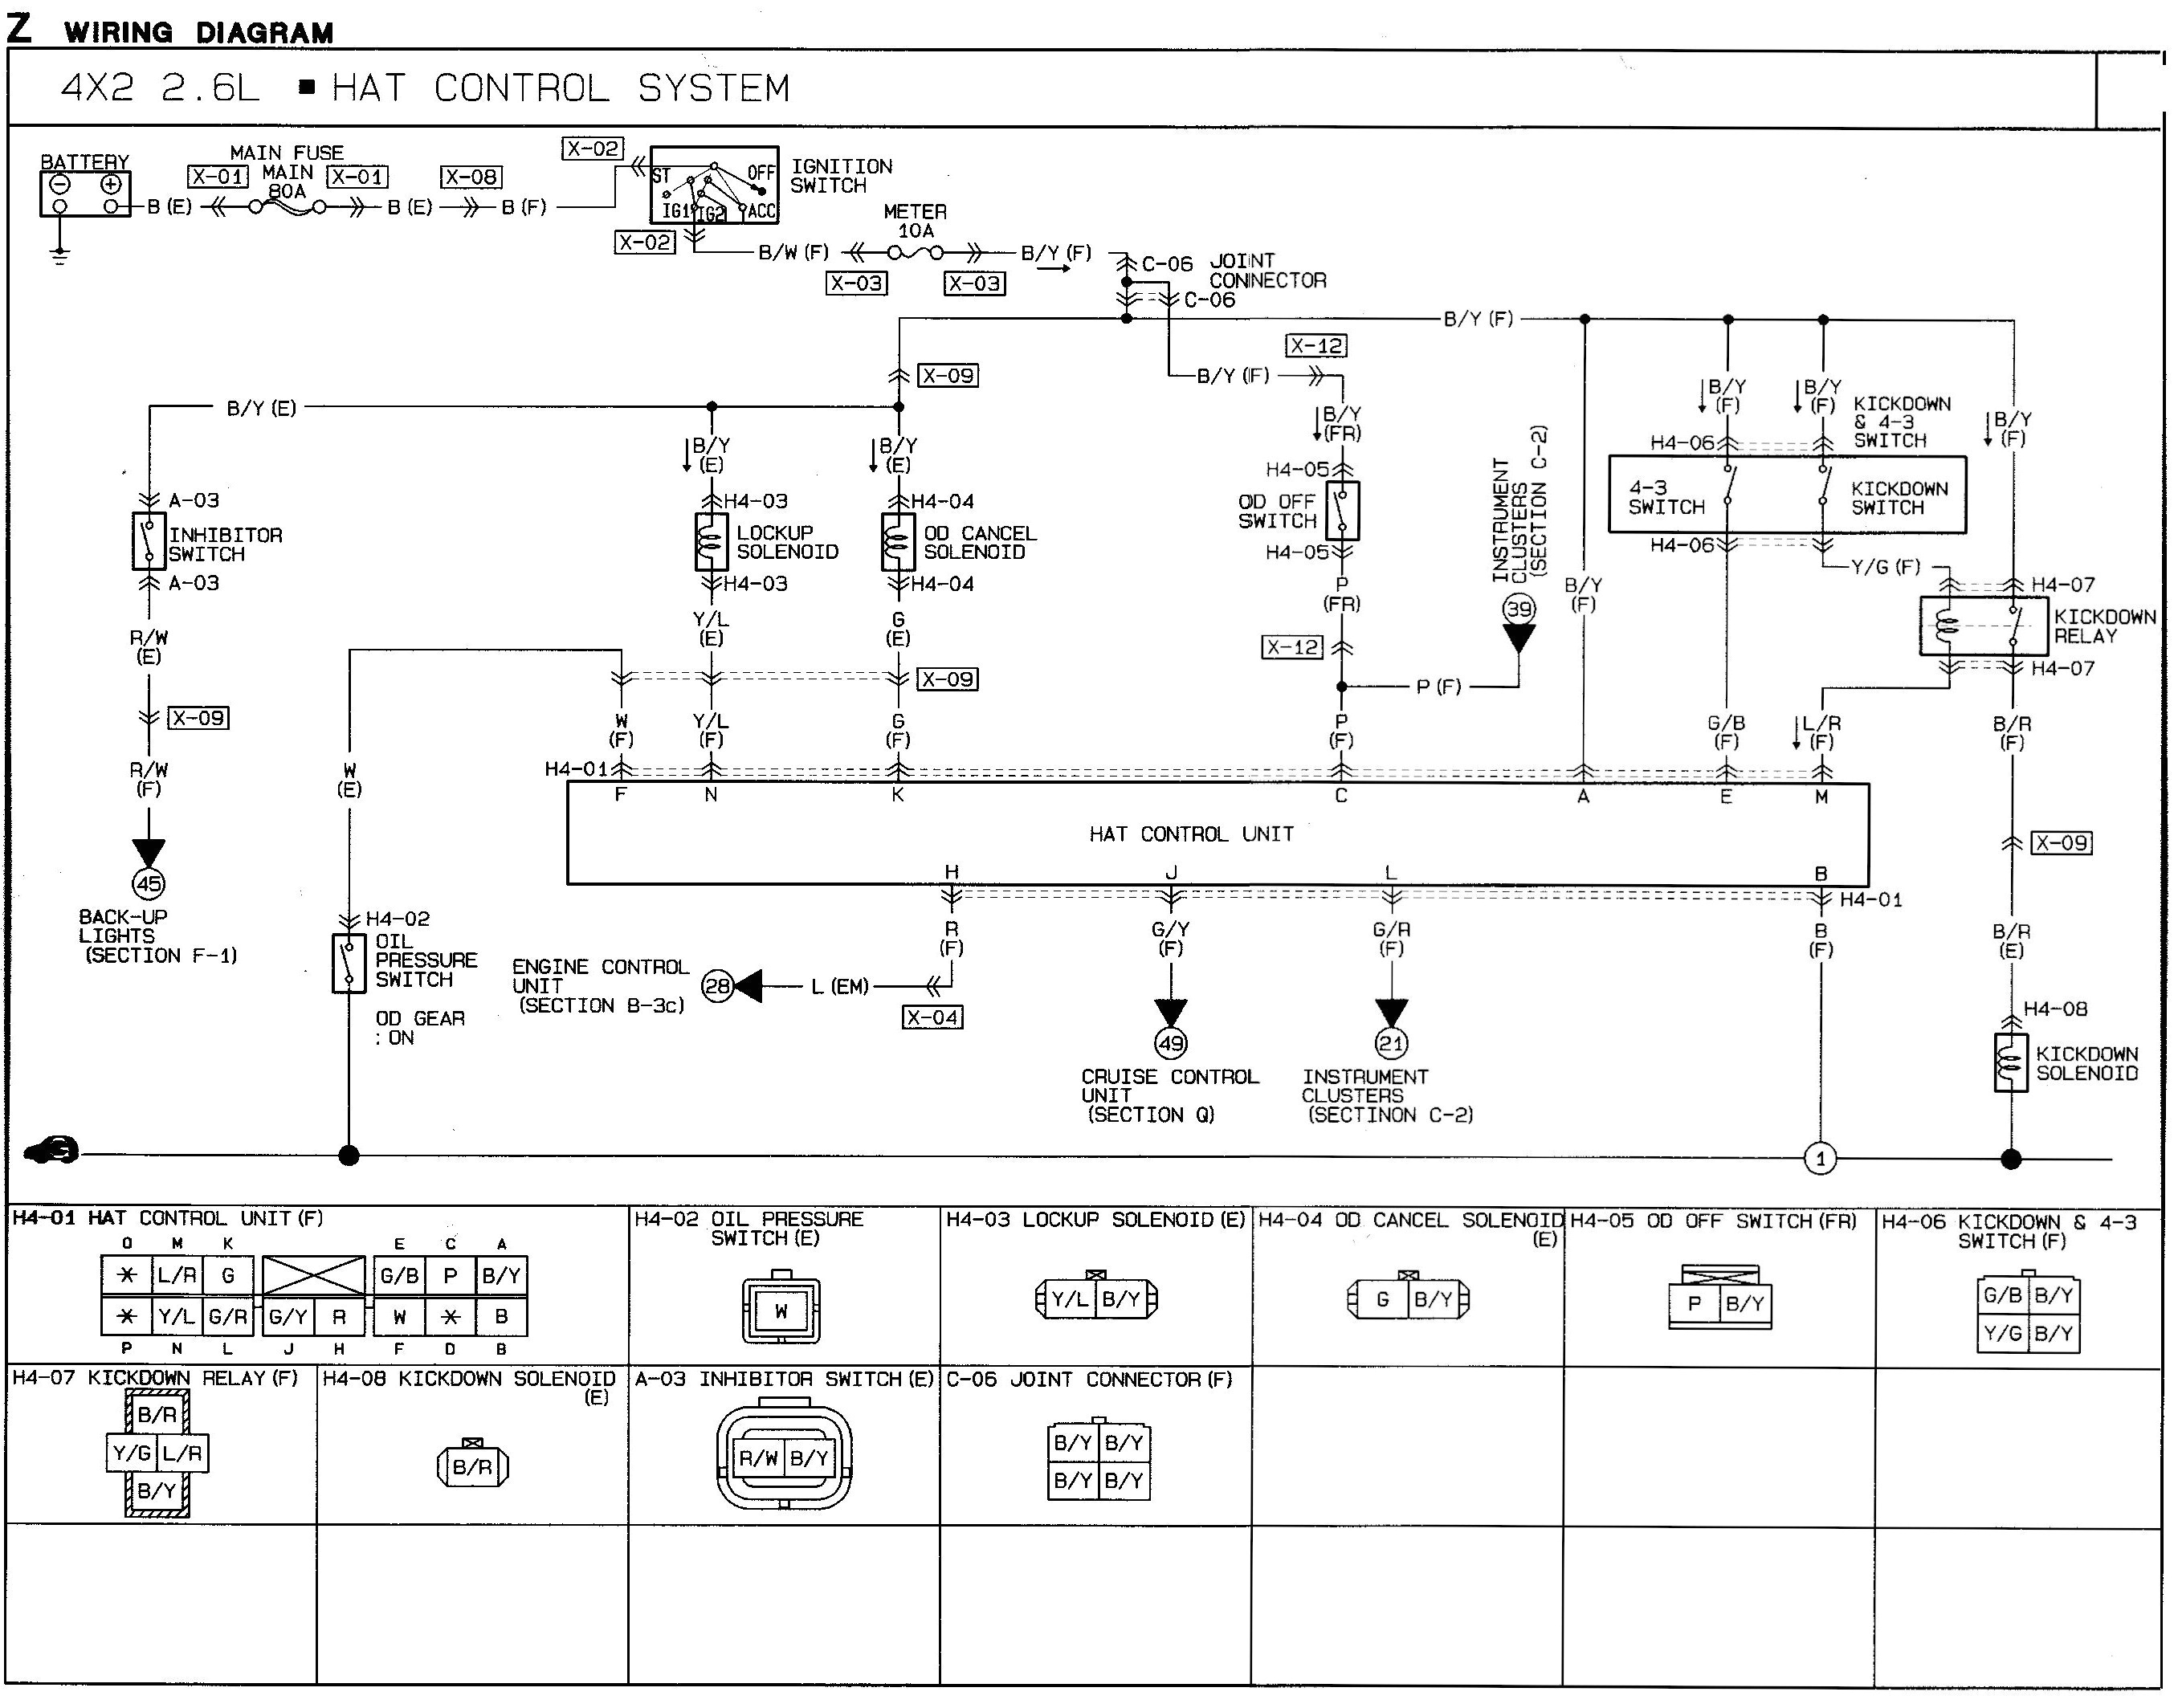 abs wiring diagram 6 electrical wiring diagram abs wiring diagram 6